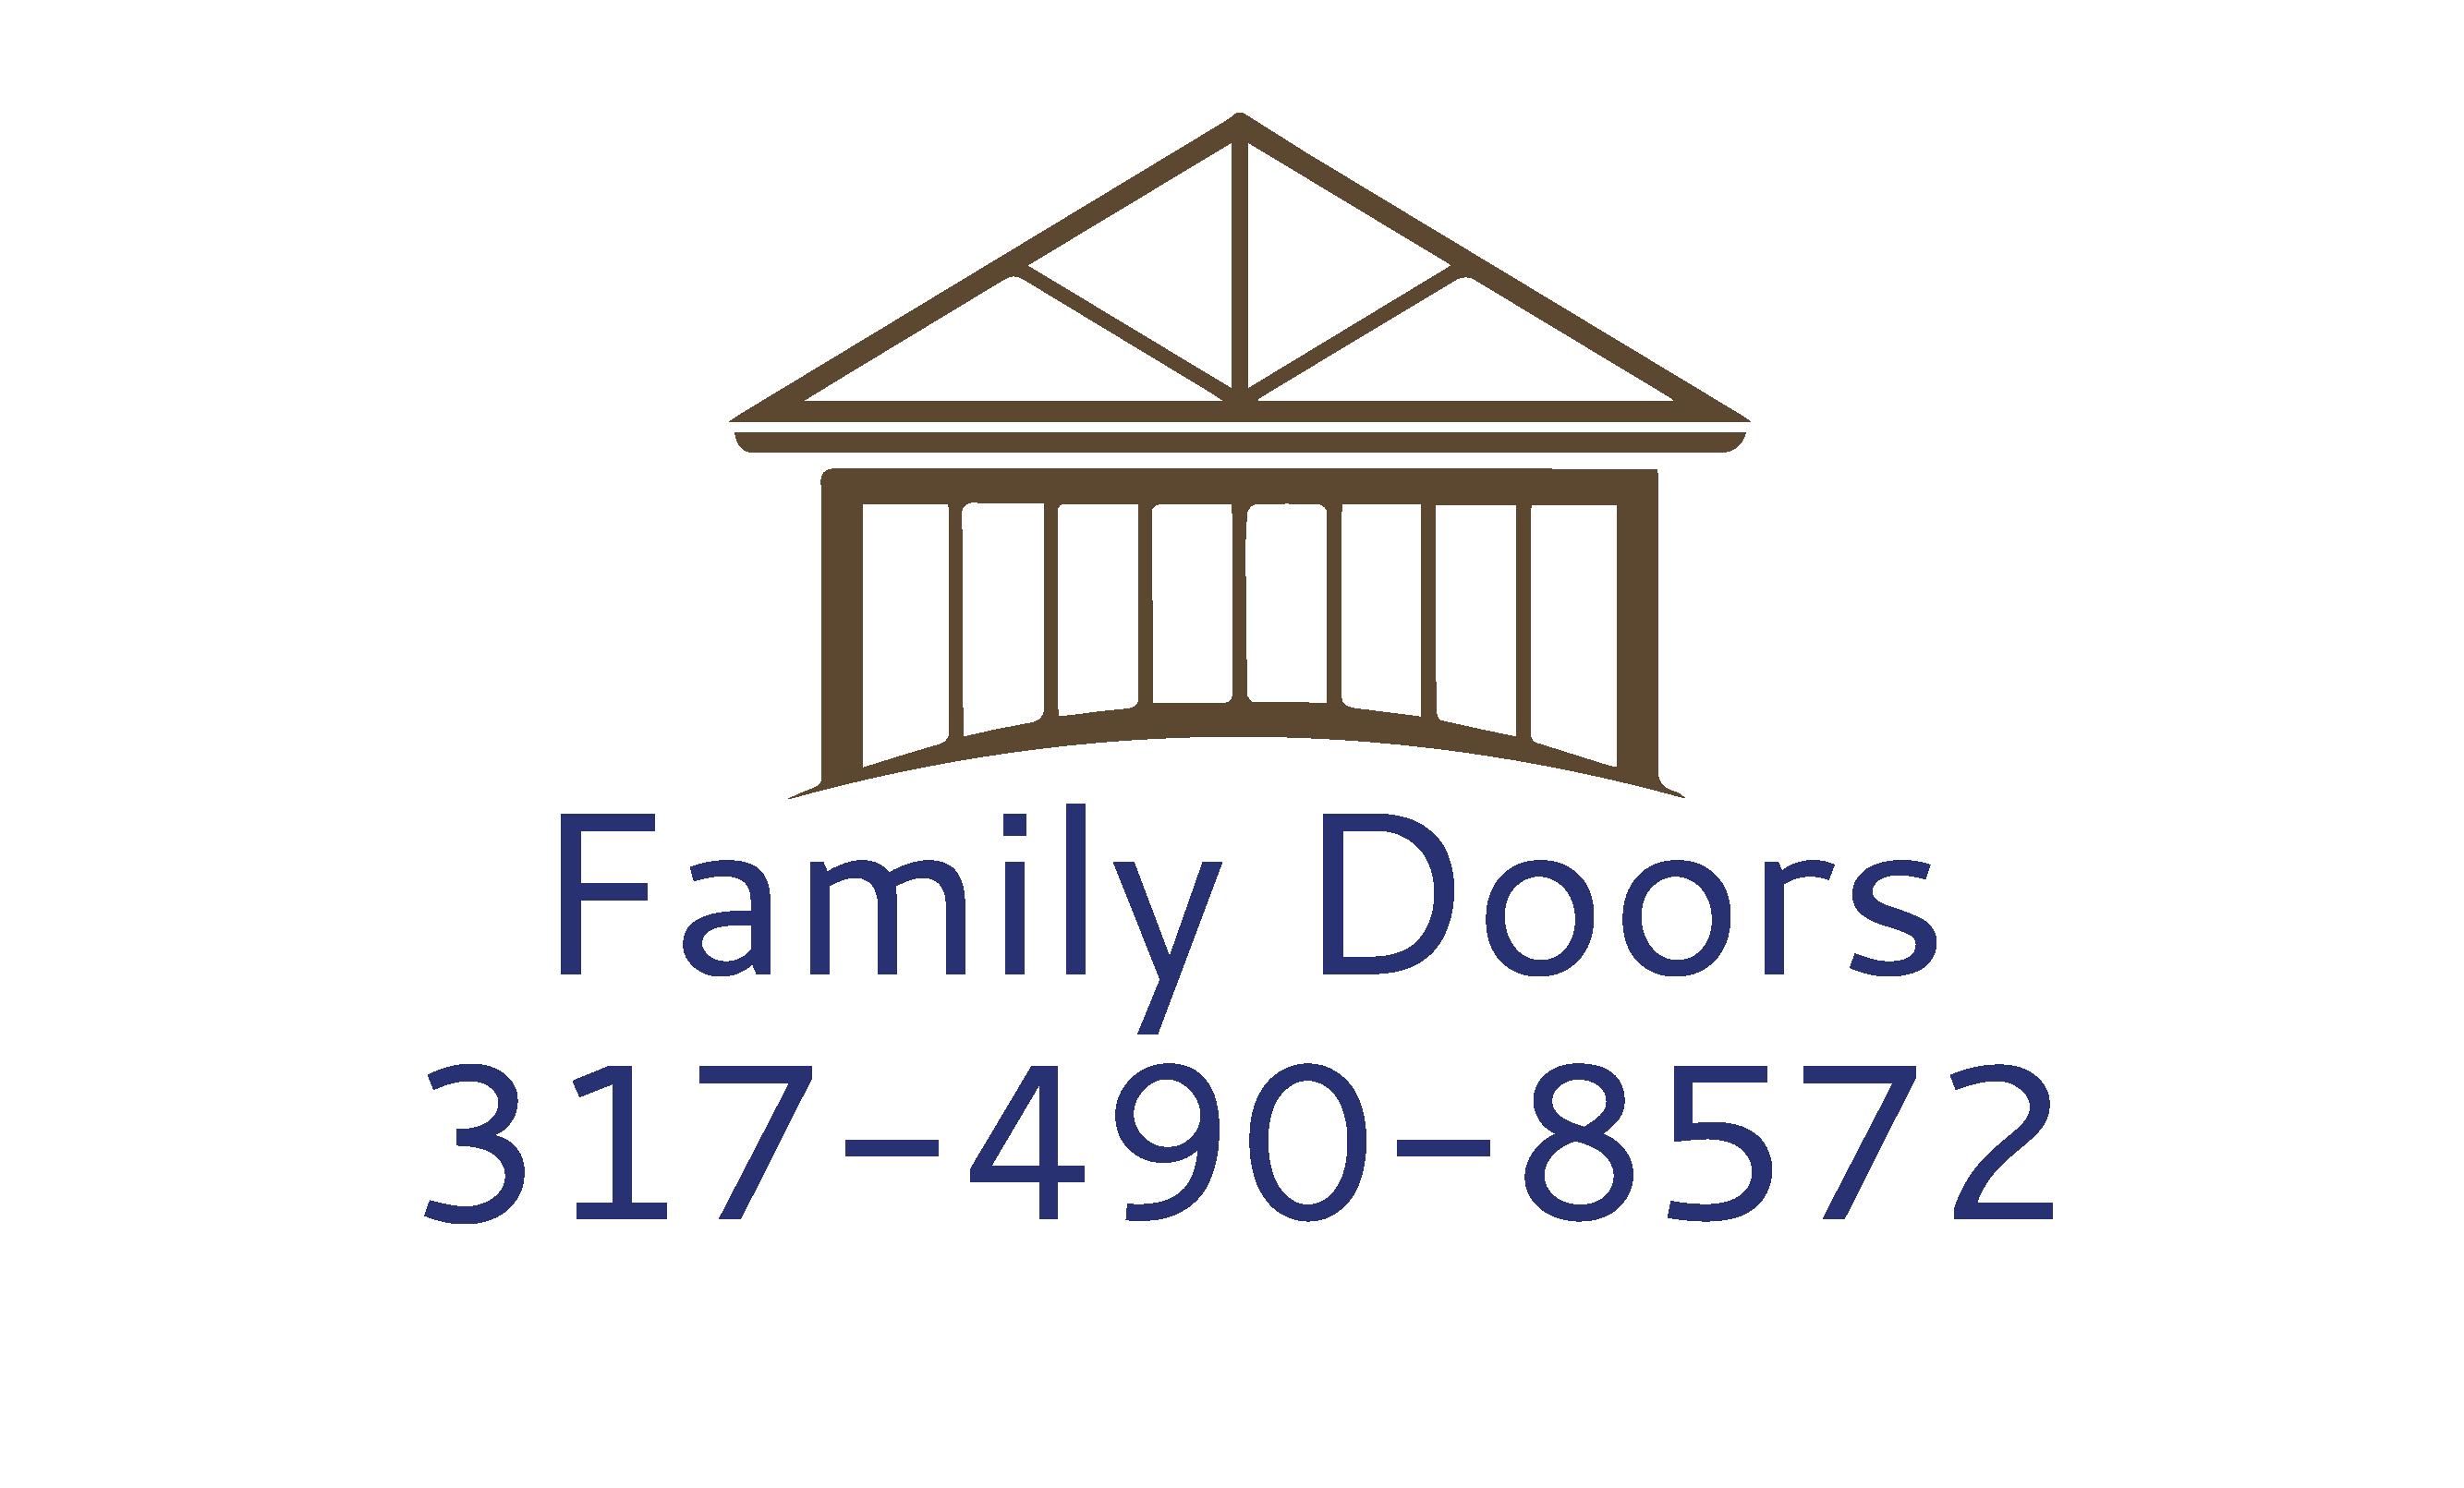 Family Doors LLC